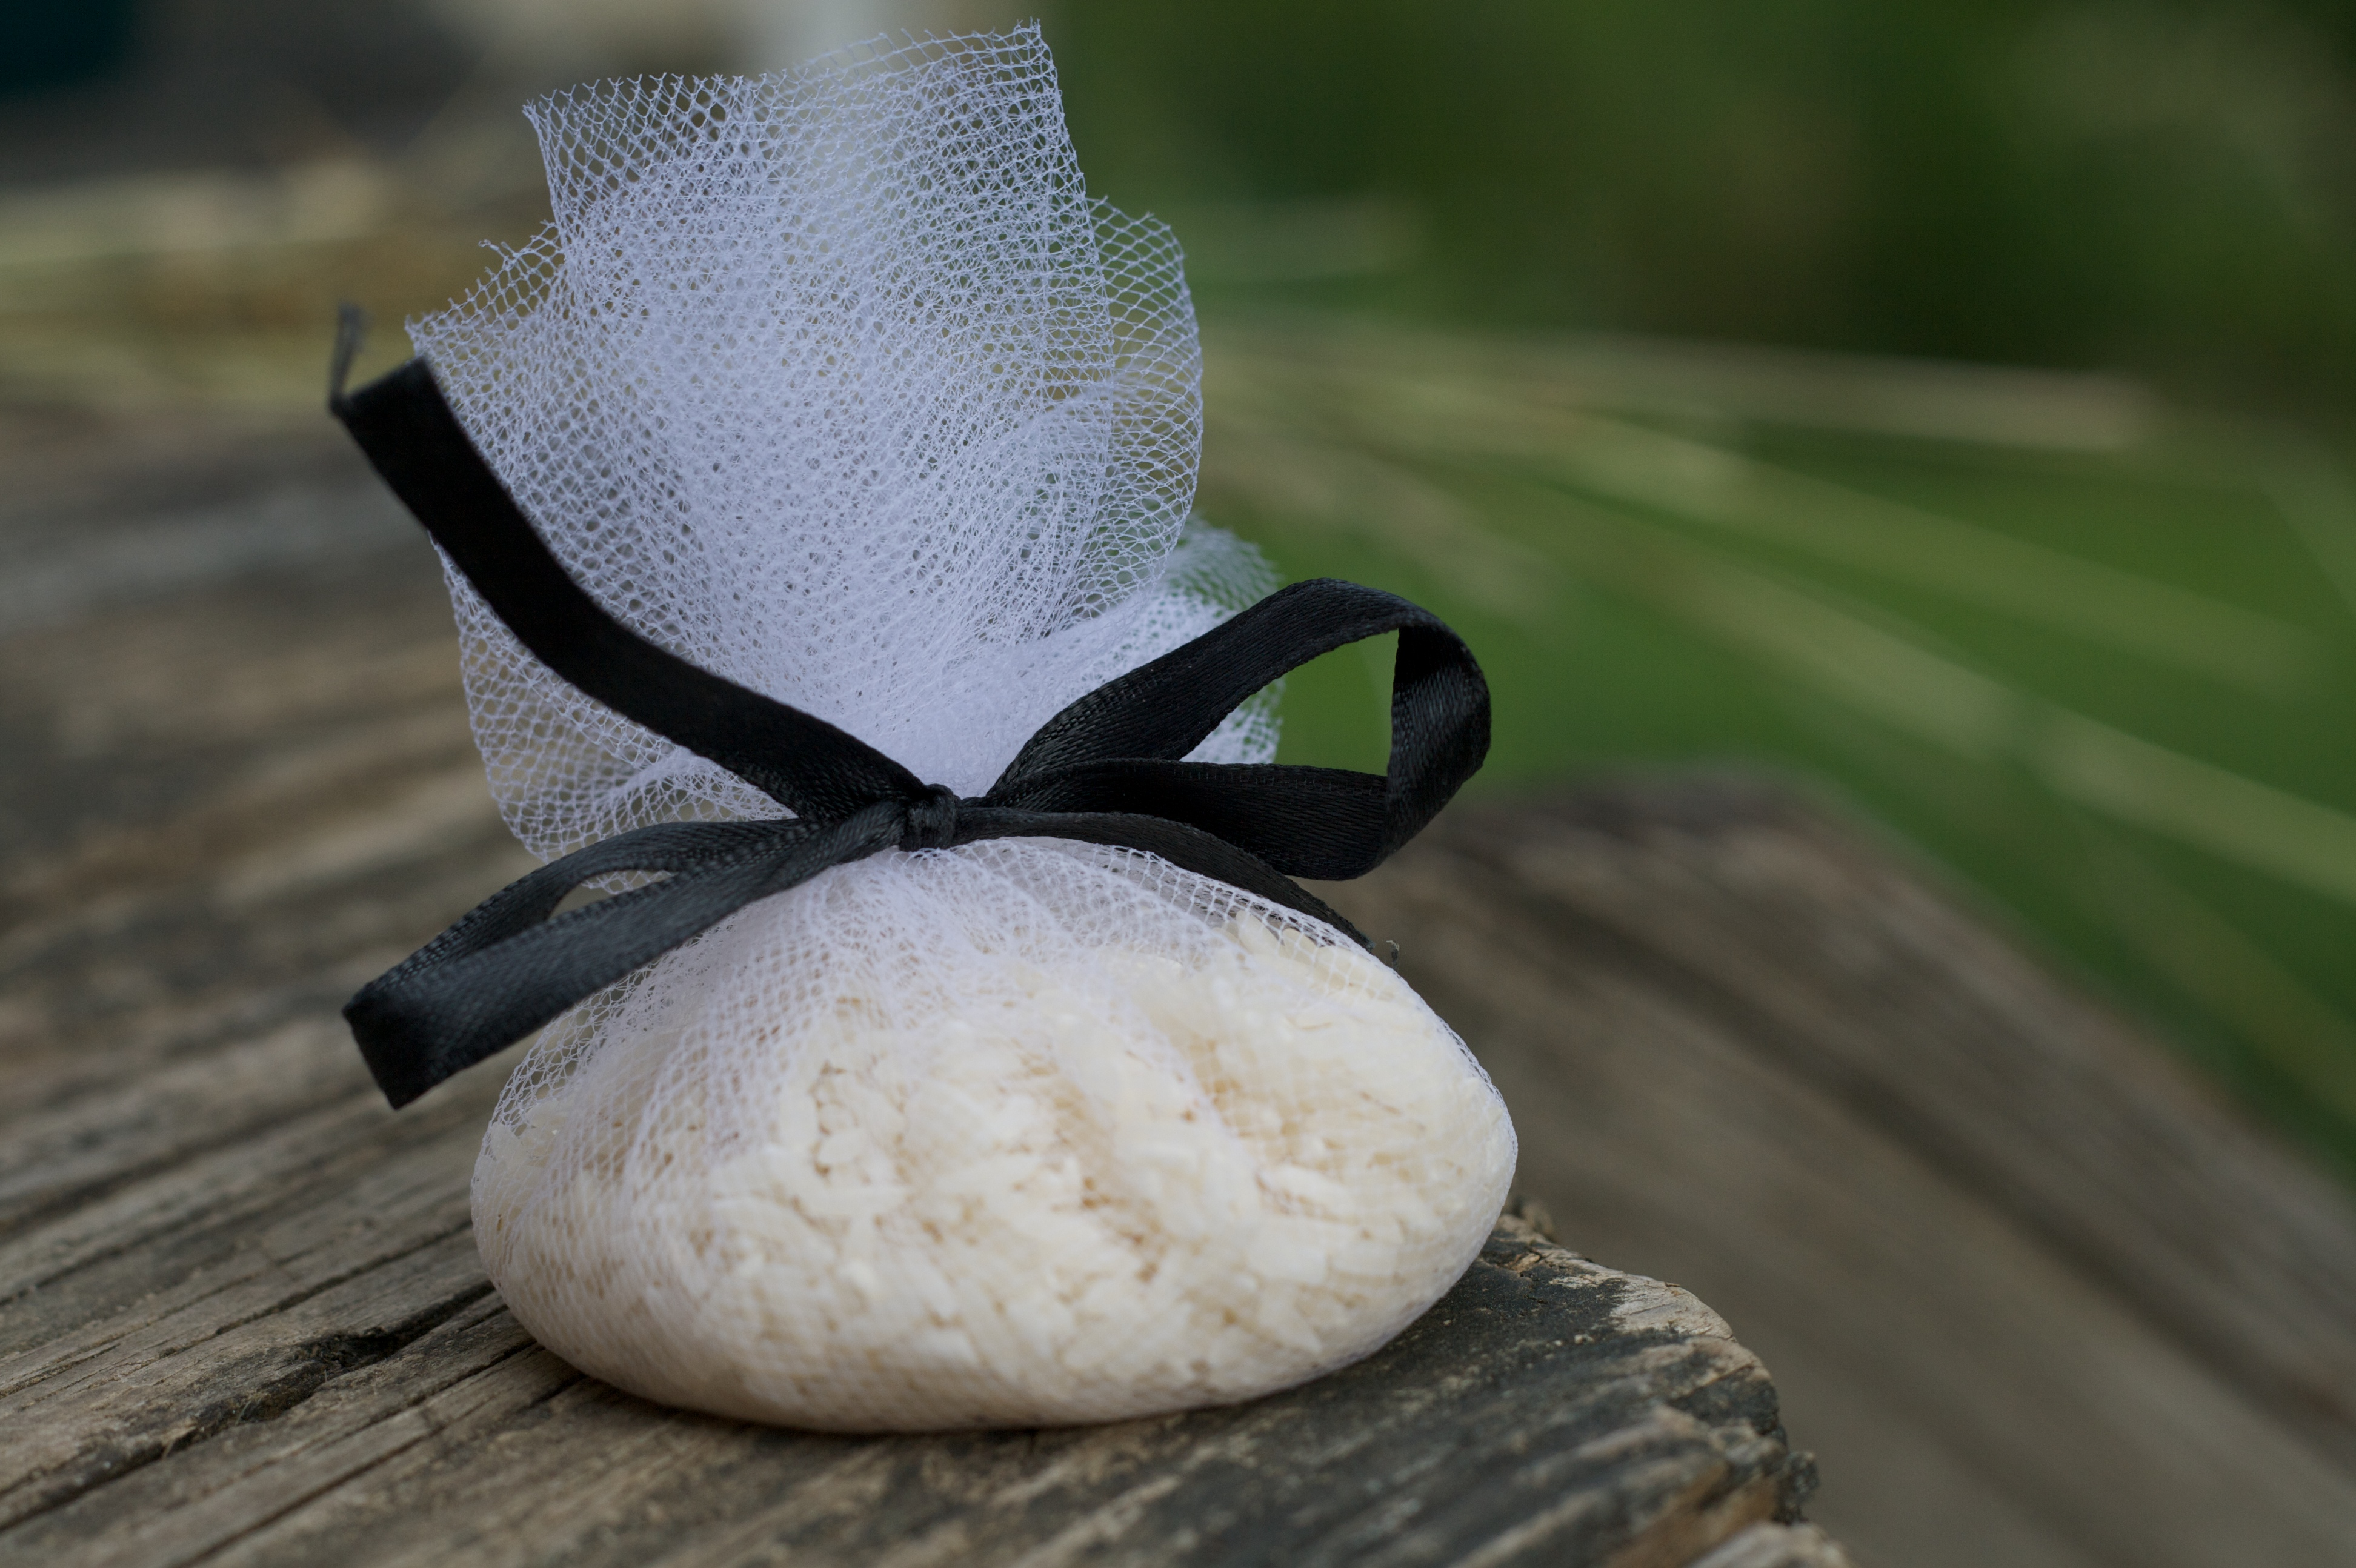 Bean Bag, una Estupenda Alternativa al Trípode